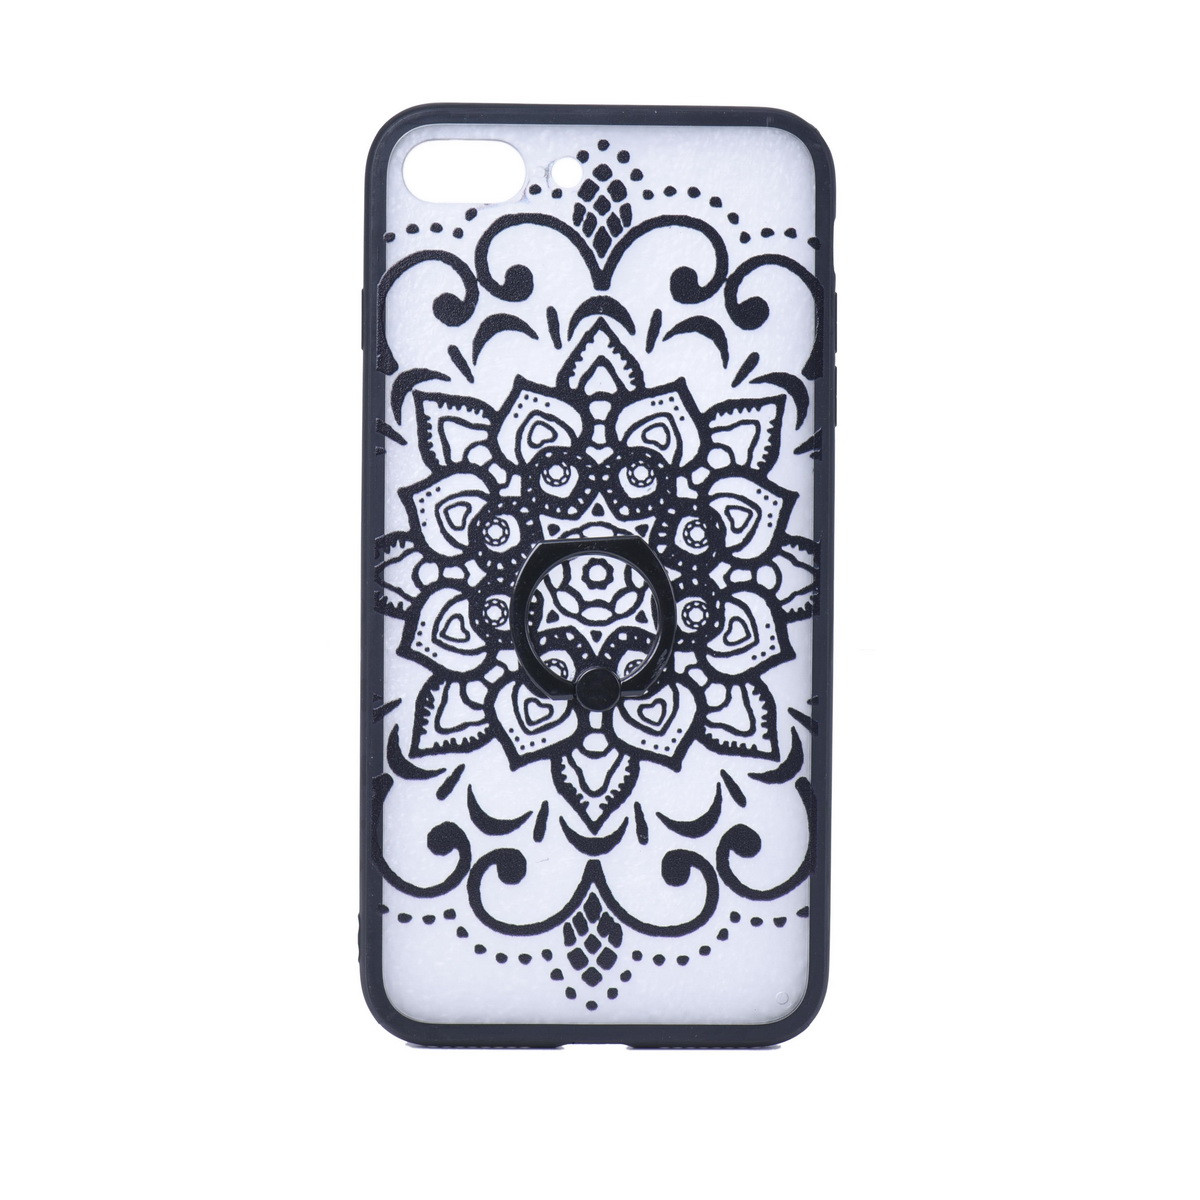 Чехол для Apple iPhone 7 Plus back cover с кольцом plastic Pattern Clear/Black